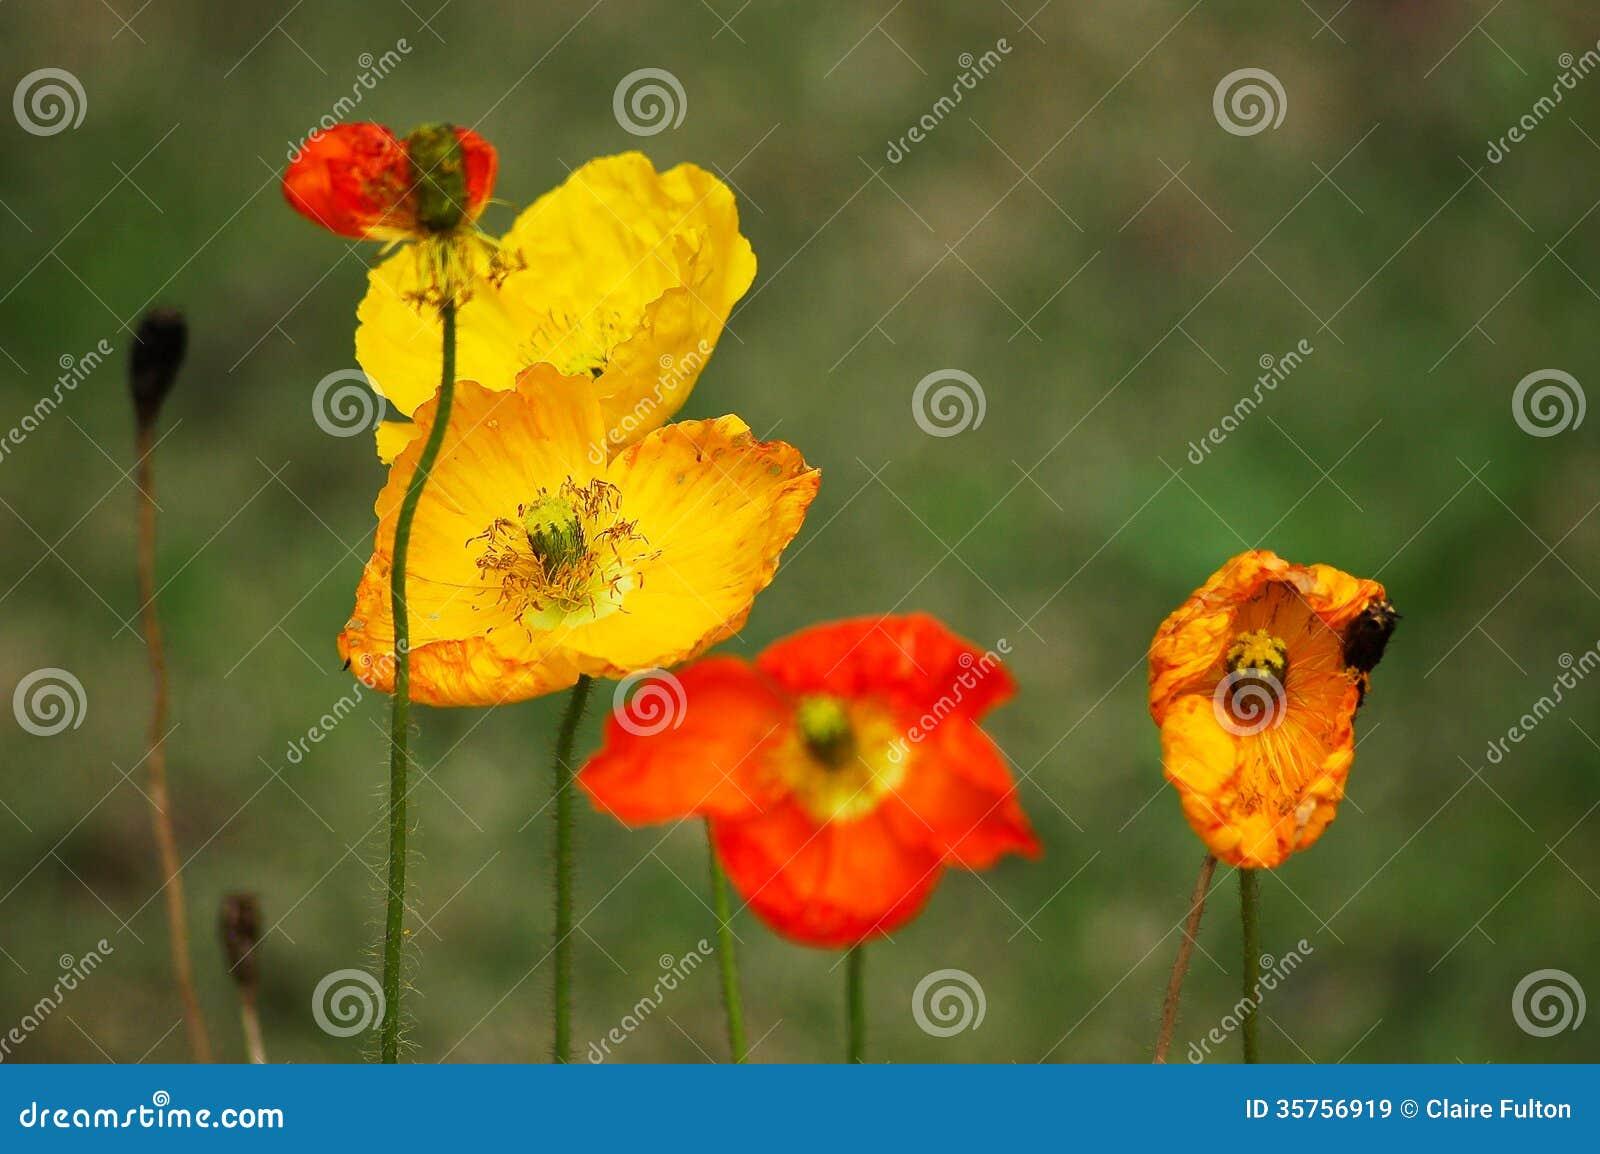 Red Yellow Poppy Flowers Stock Image Image Of Poppy 35756919